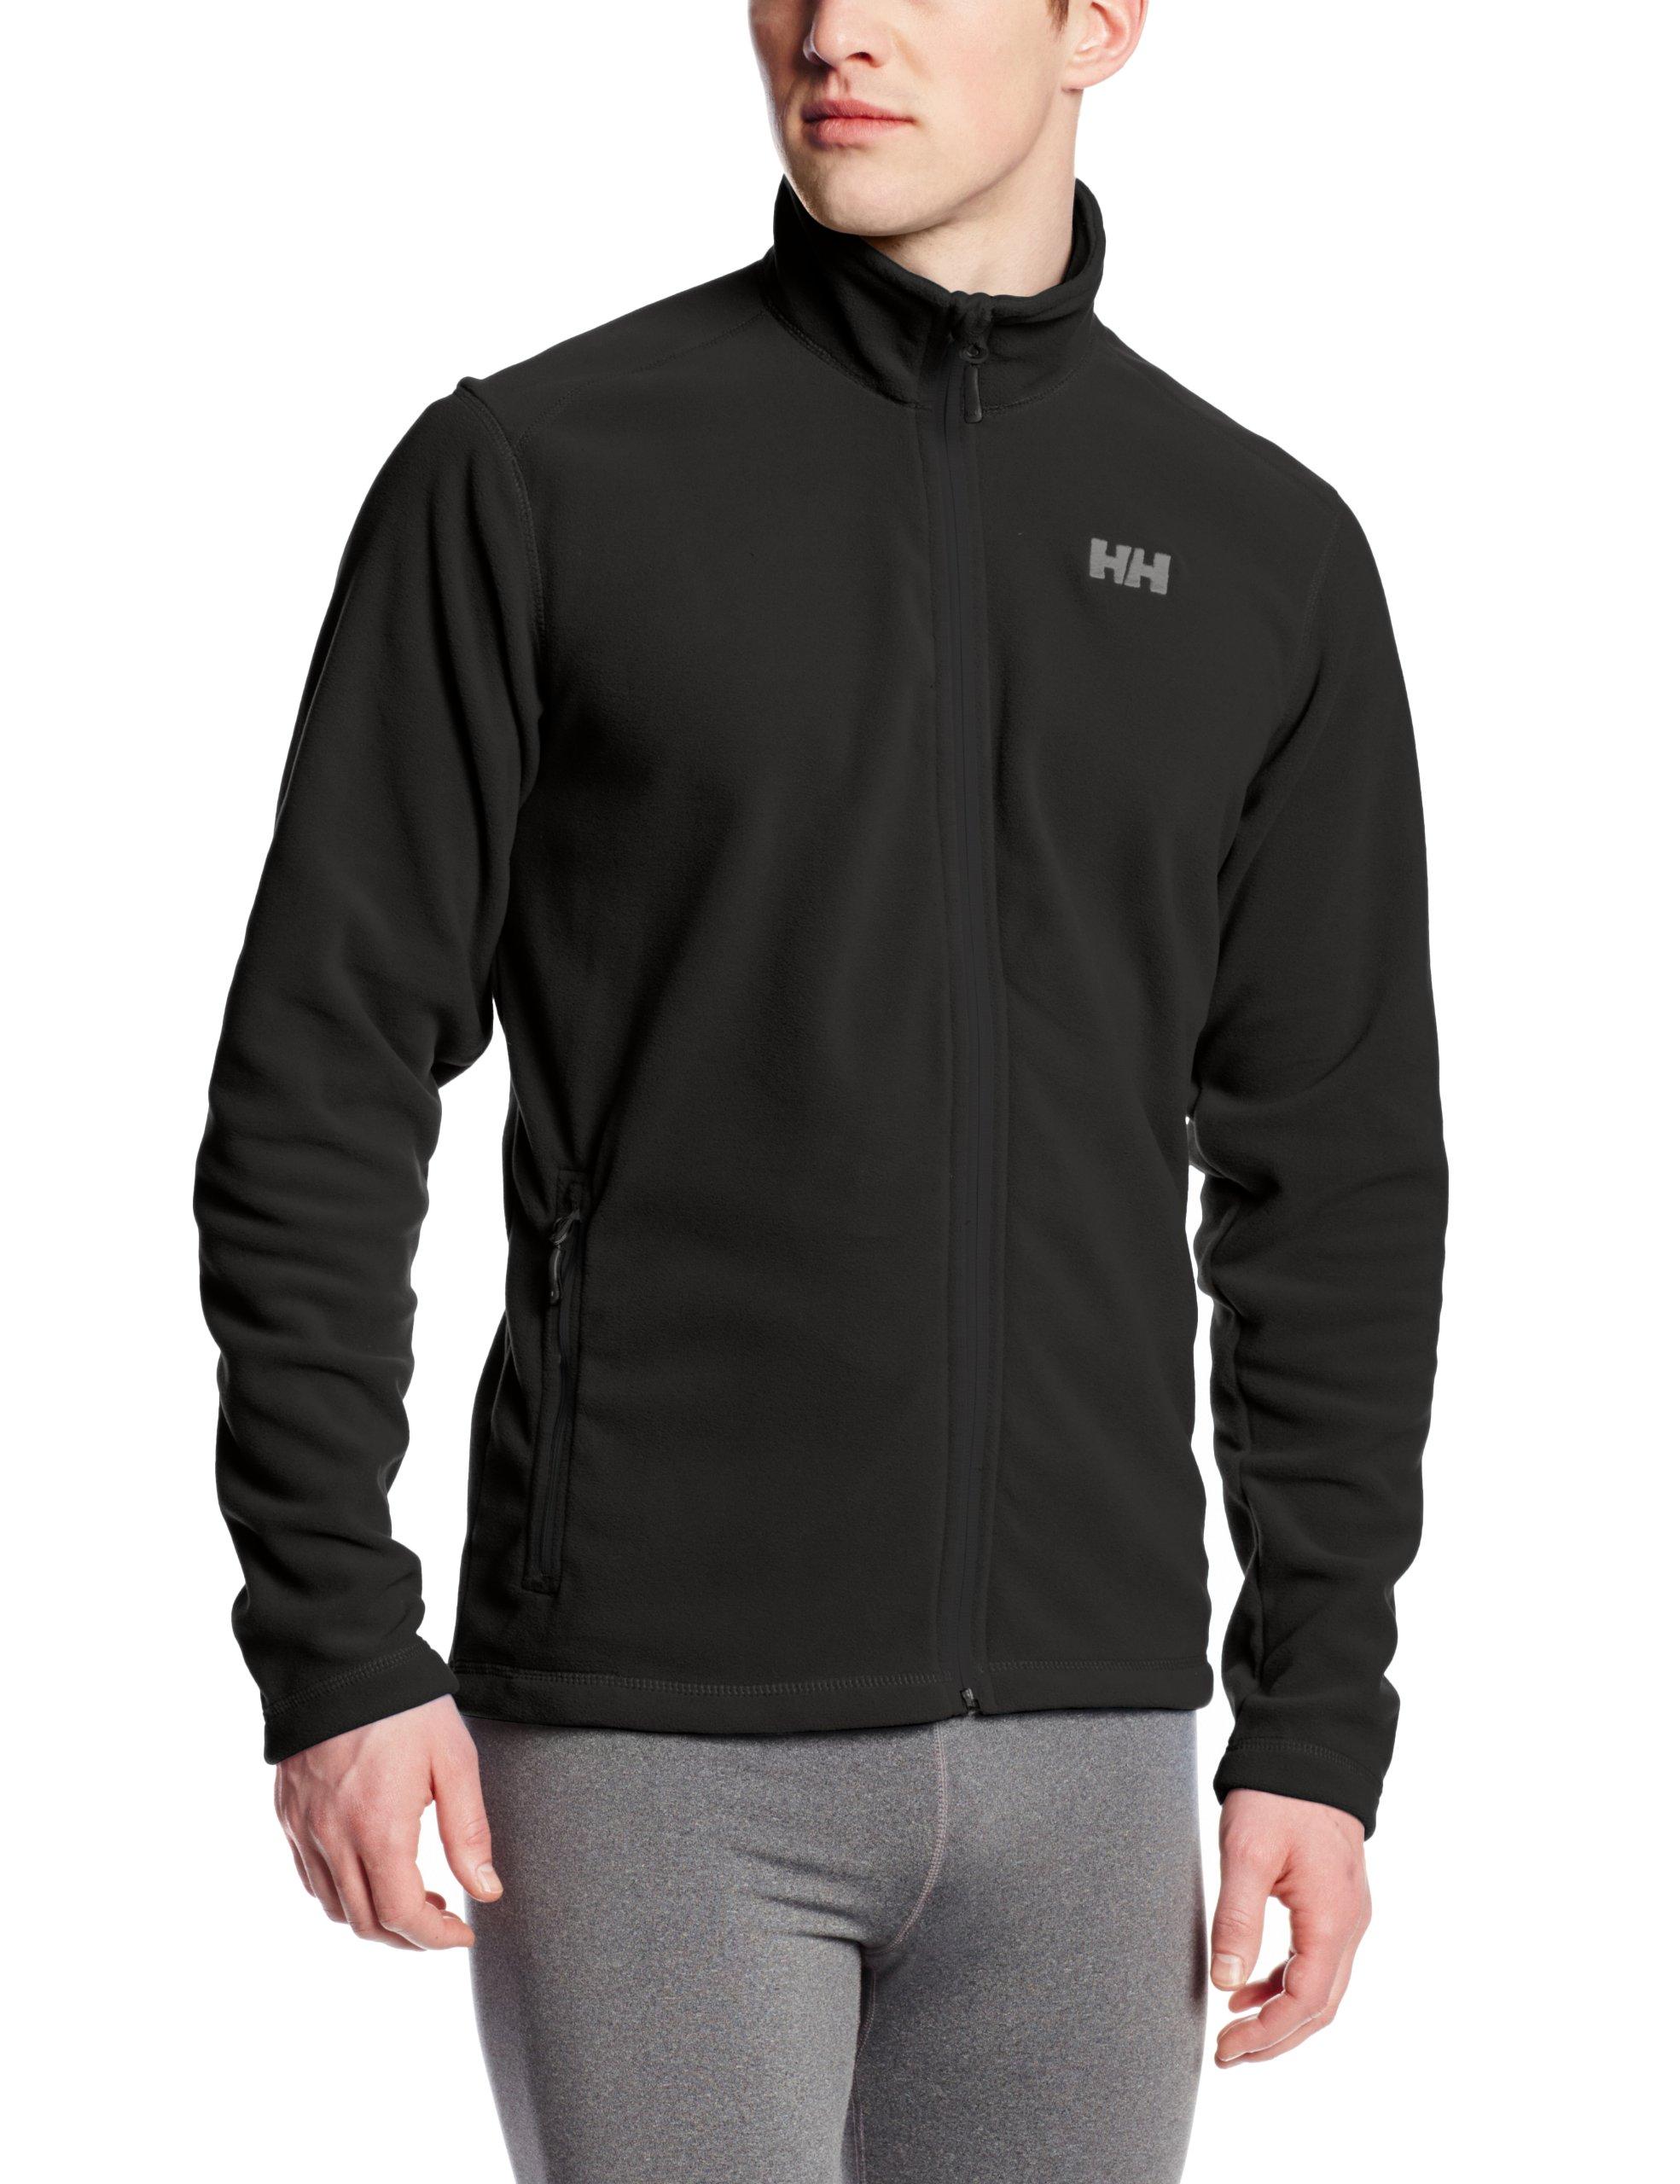 Helly Hansen Men's Daybreaker Lightweight Full Zip Fleece Jacket, 990 Black, Large